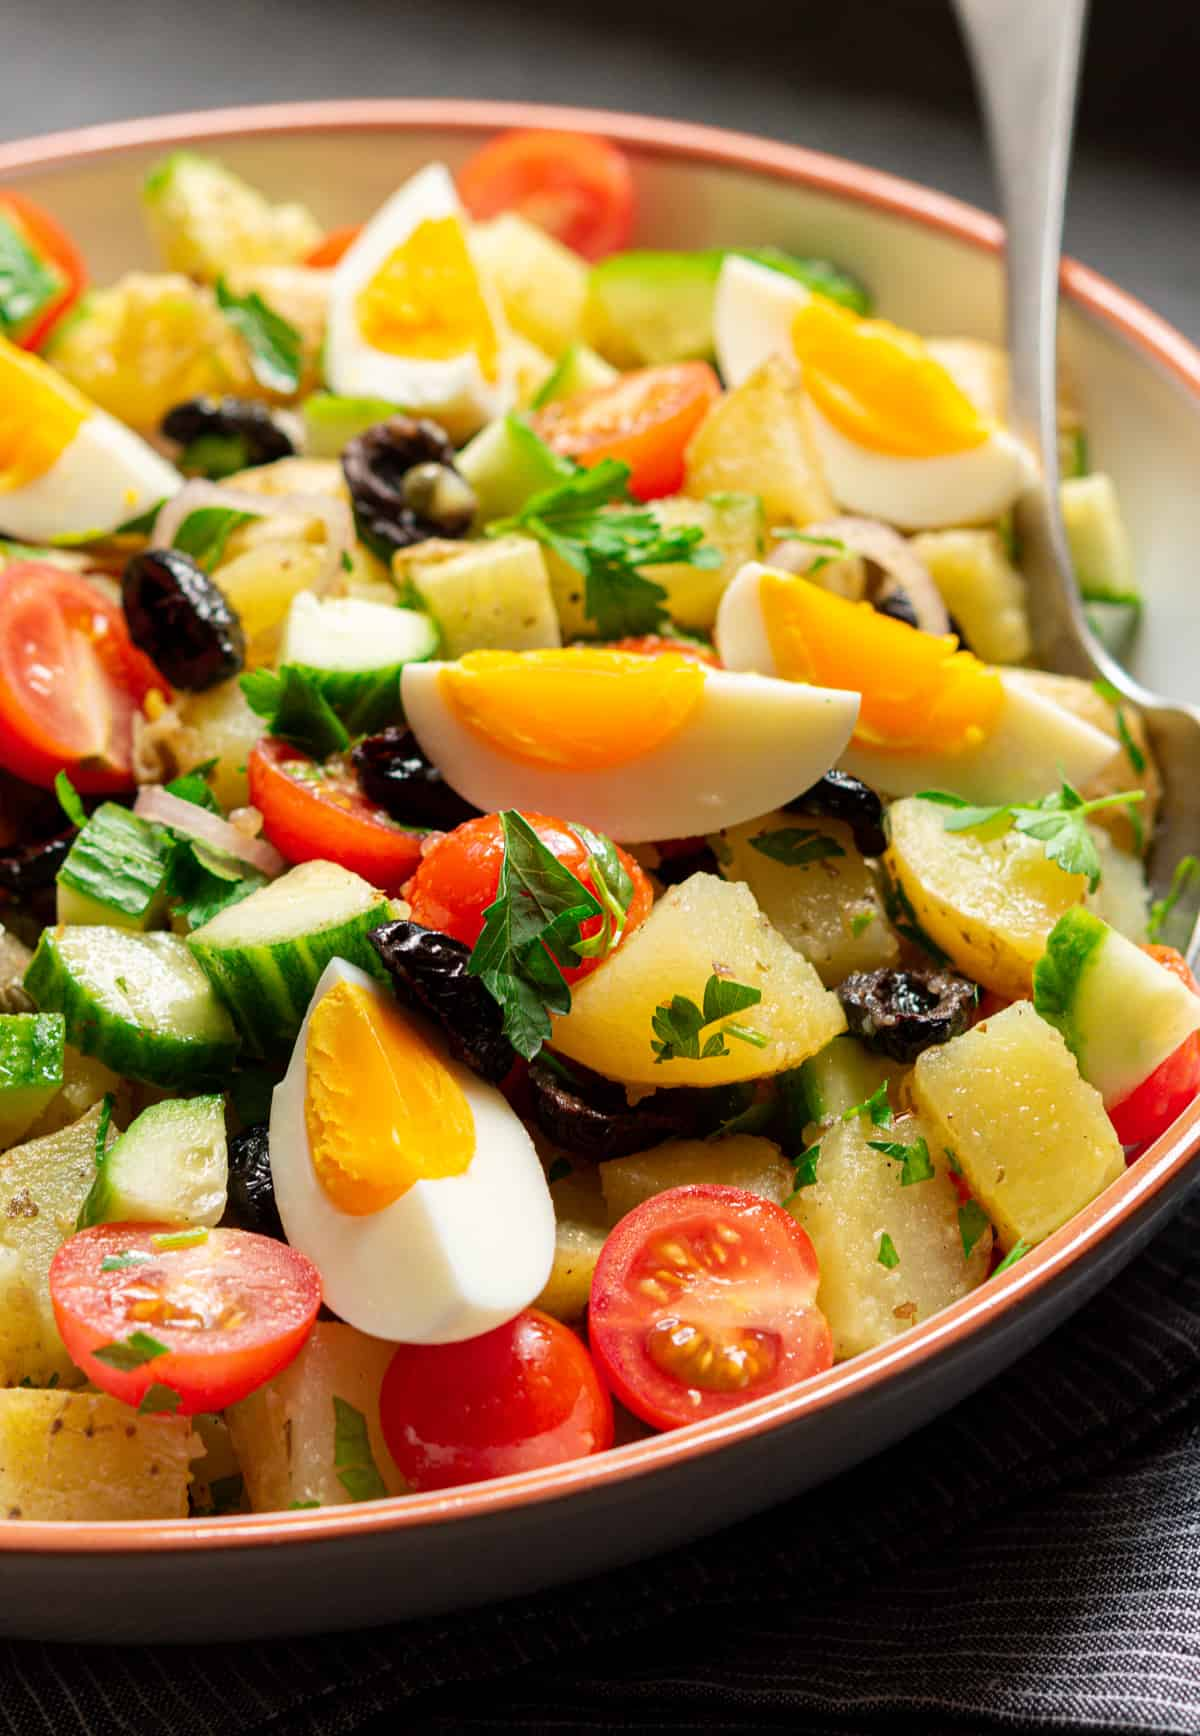 Greek Potato Salad served in a white ceramic bowl